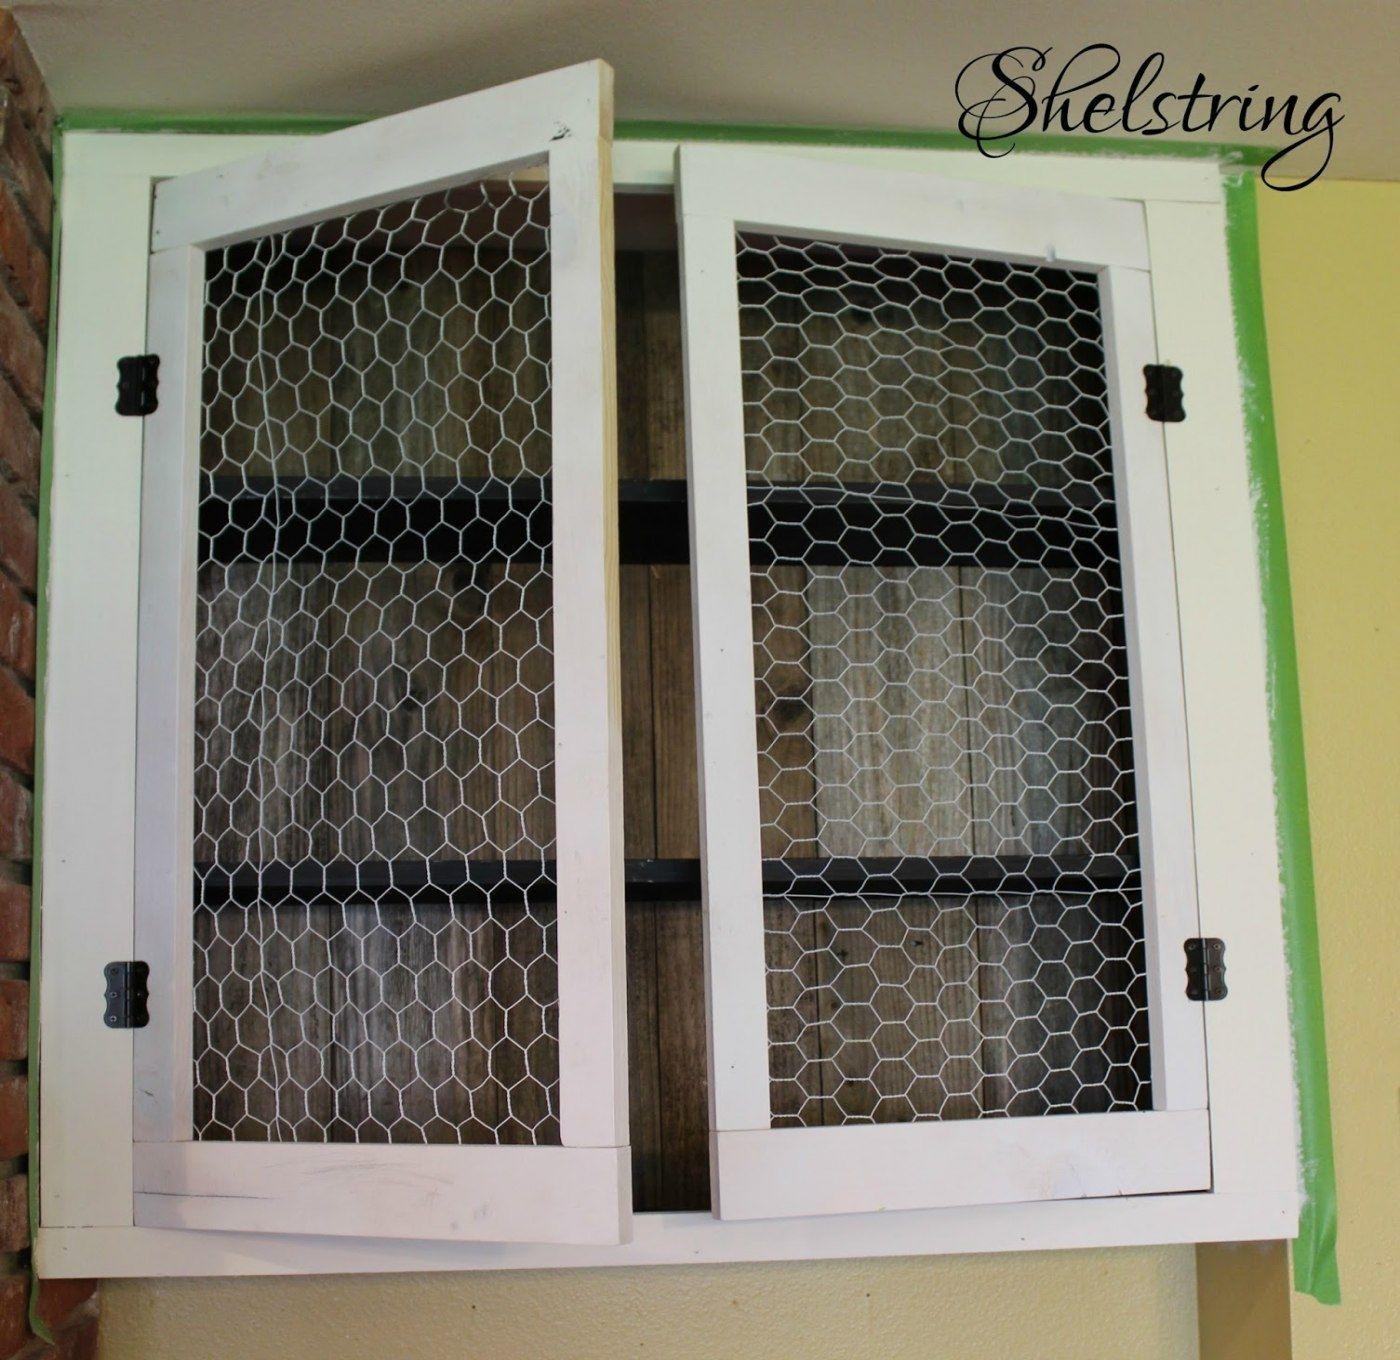 Mesh Wire Door Inserts Cabinet Nilza Screen For Doors Magnetic Locks No Drill Led Lighting Dimmable Gr Diy Cabinet Doors Cabinet Doors Repurposed Cabinet Doors